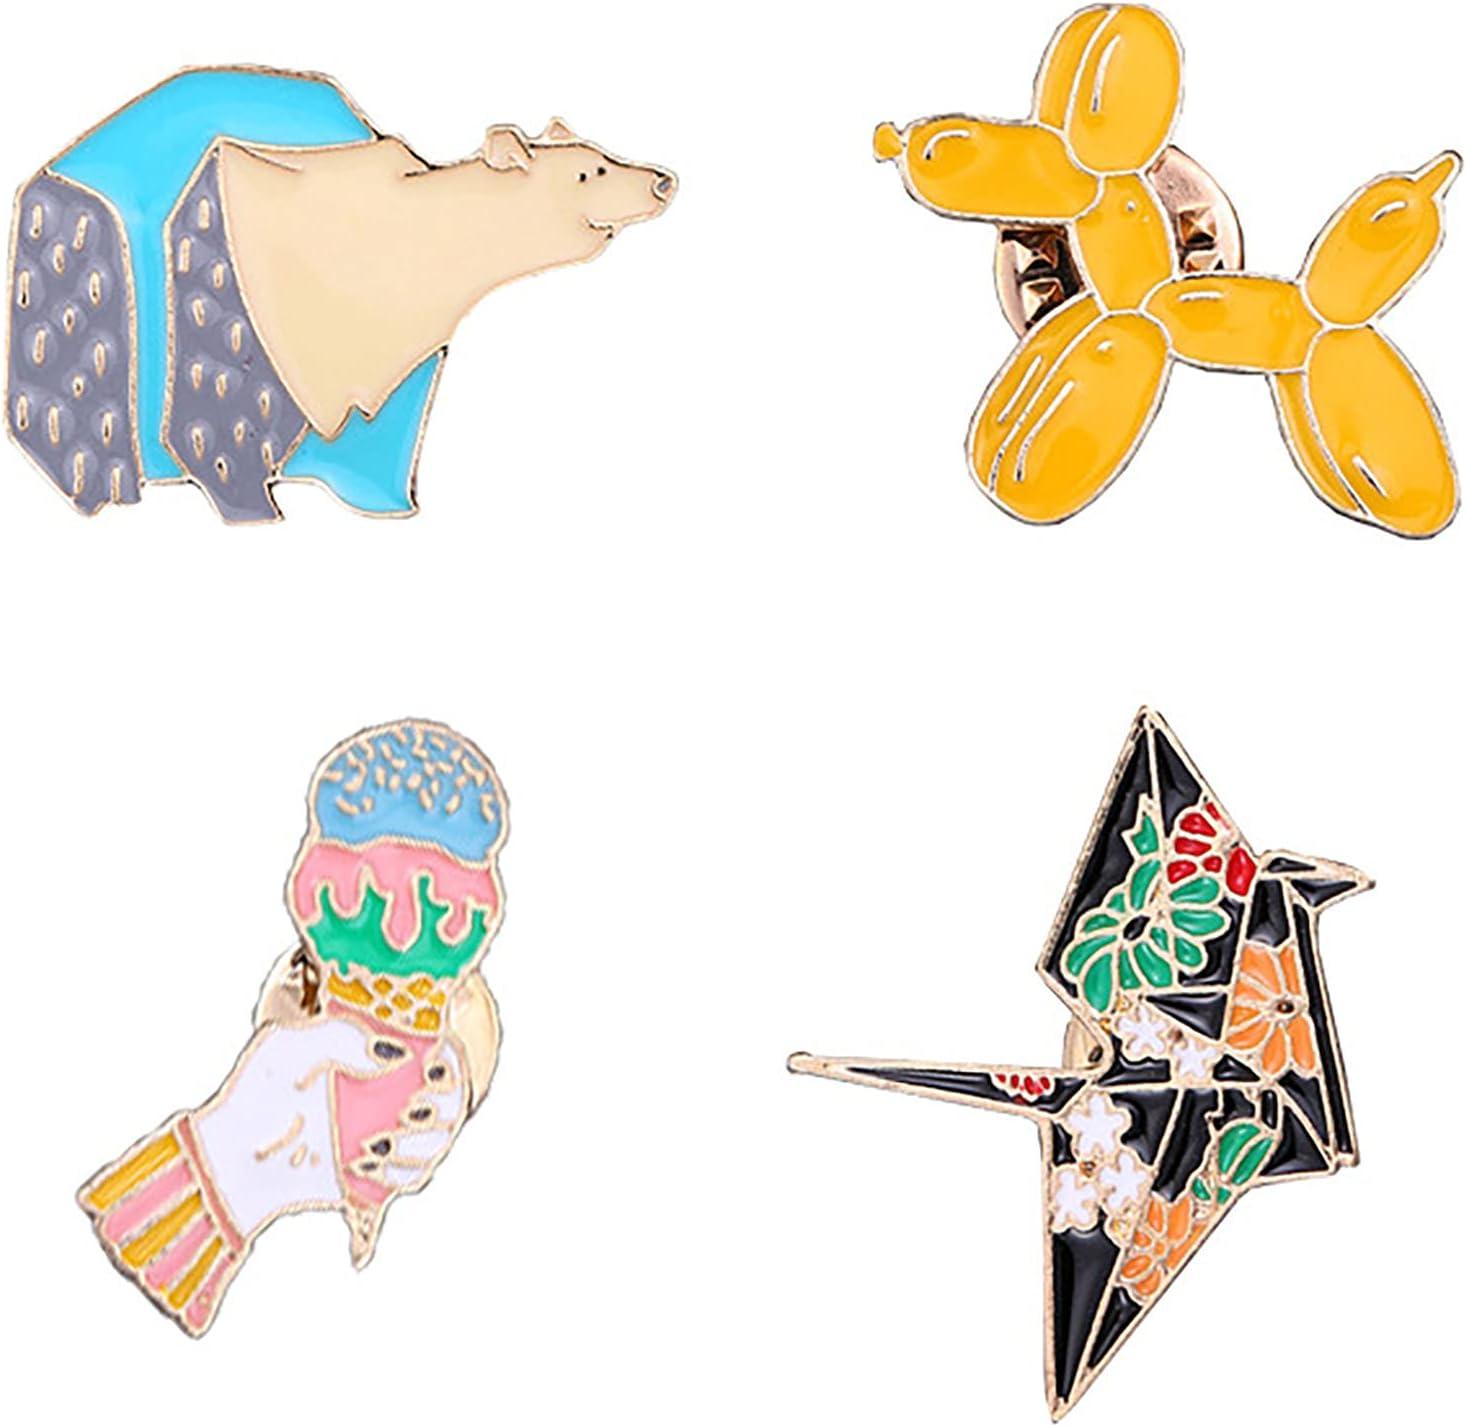 4pcs Cartoon Brooch, Paper Crane Polar Bear Balloon Dog Ice Cream Lapel Enamel Pin Boy Girl Hat Backpack Shirt Pants Alloy Badge